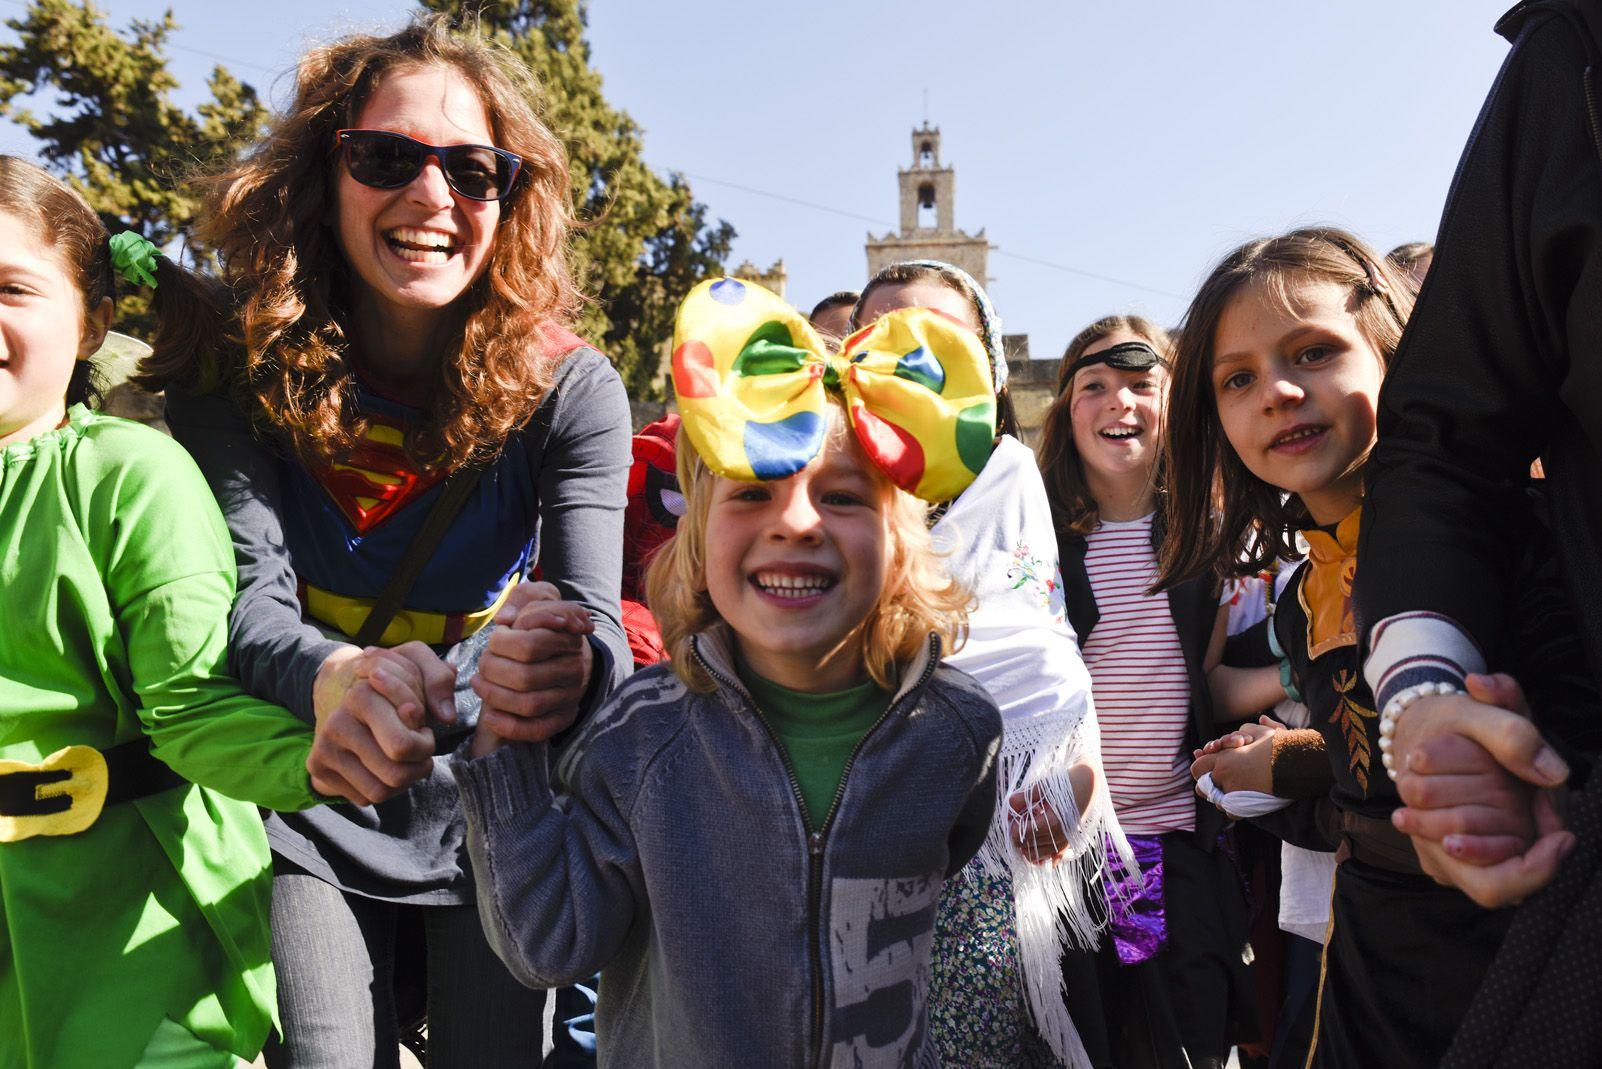 Ball de Gitanetes de Carnaval. Foto: Bernat Millet.